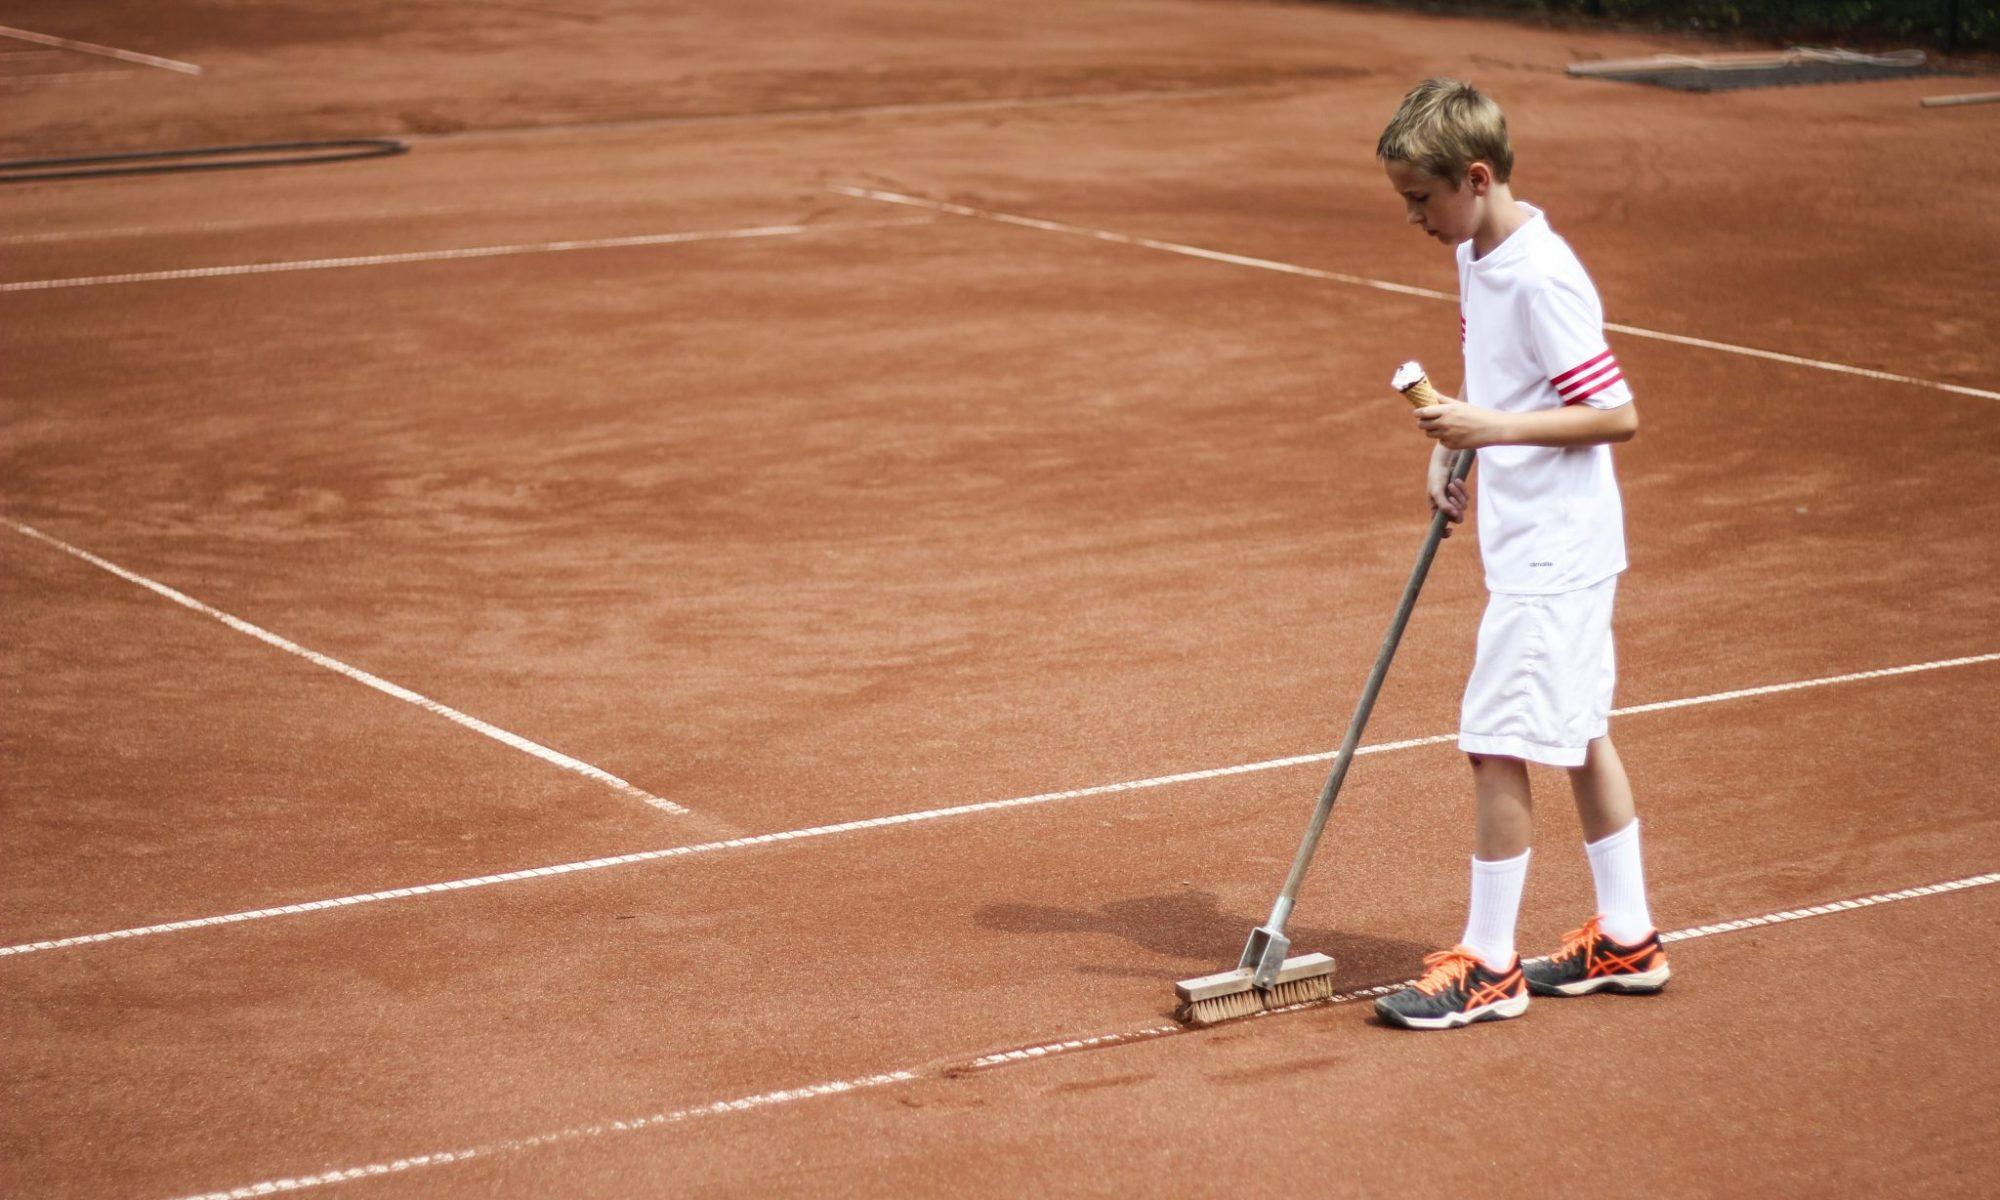 HTC | Hagener Tennis Club